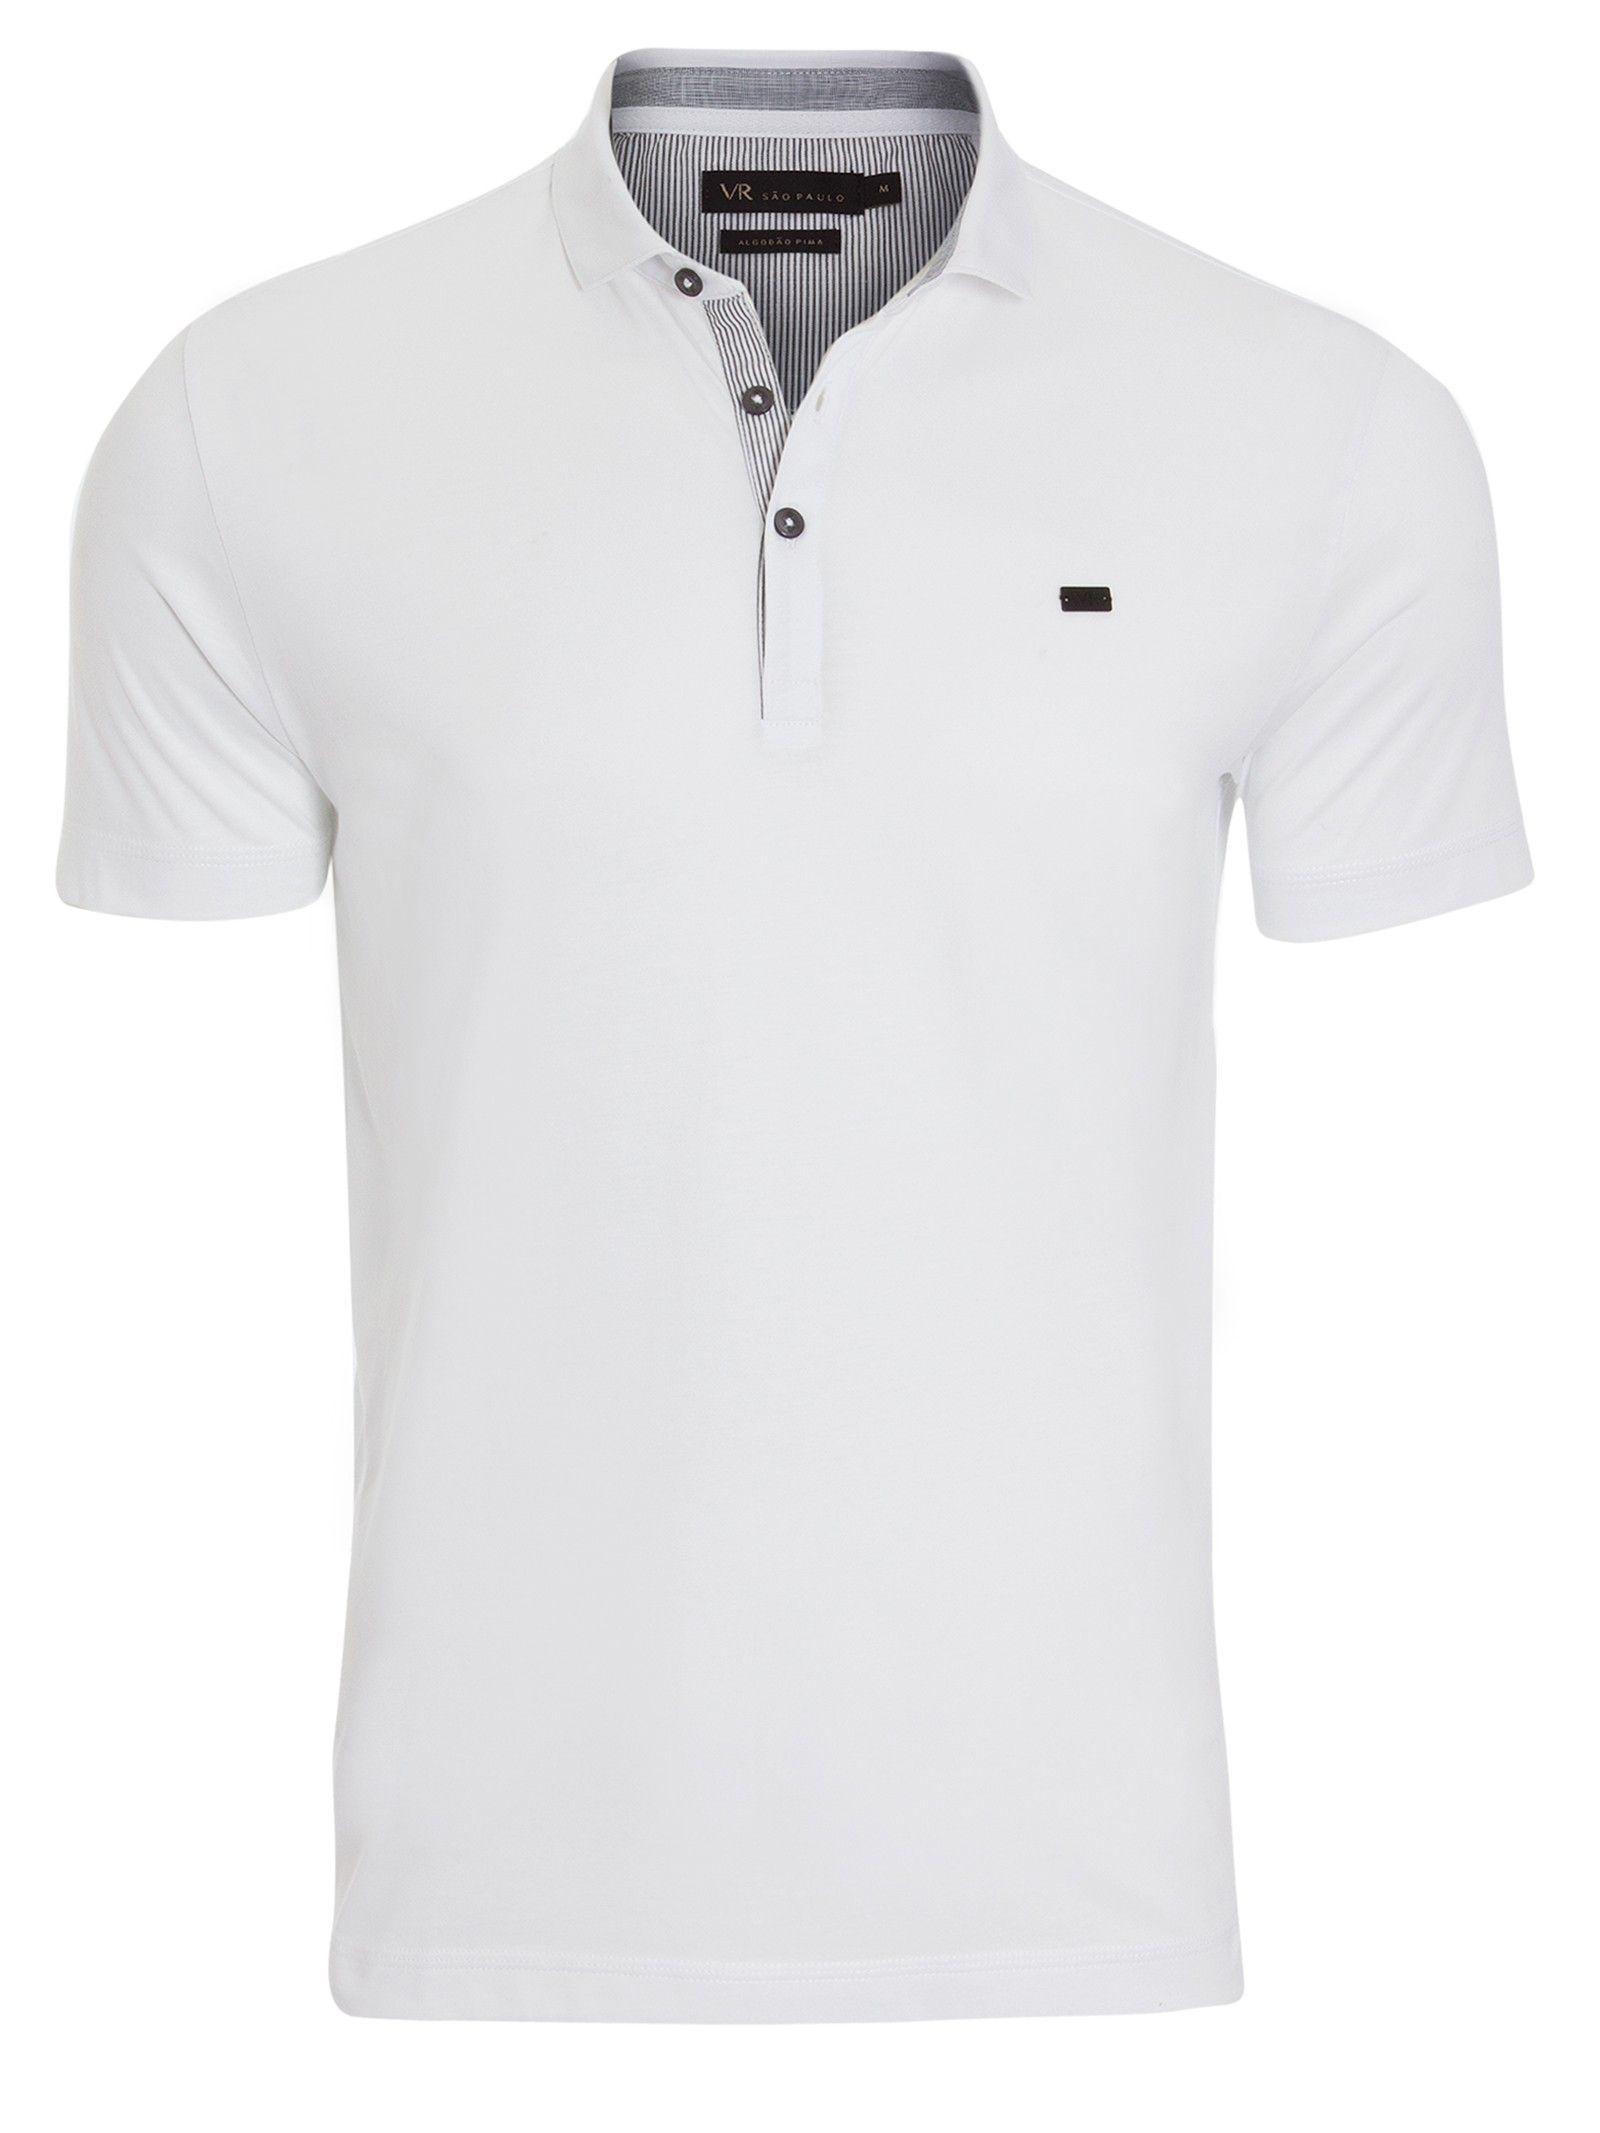 POLO MALHA - BRANCO Camisa Polo Branca Masculina e18ff0b35bd